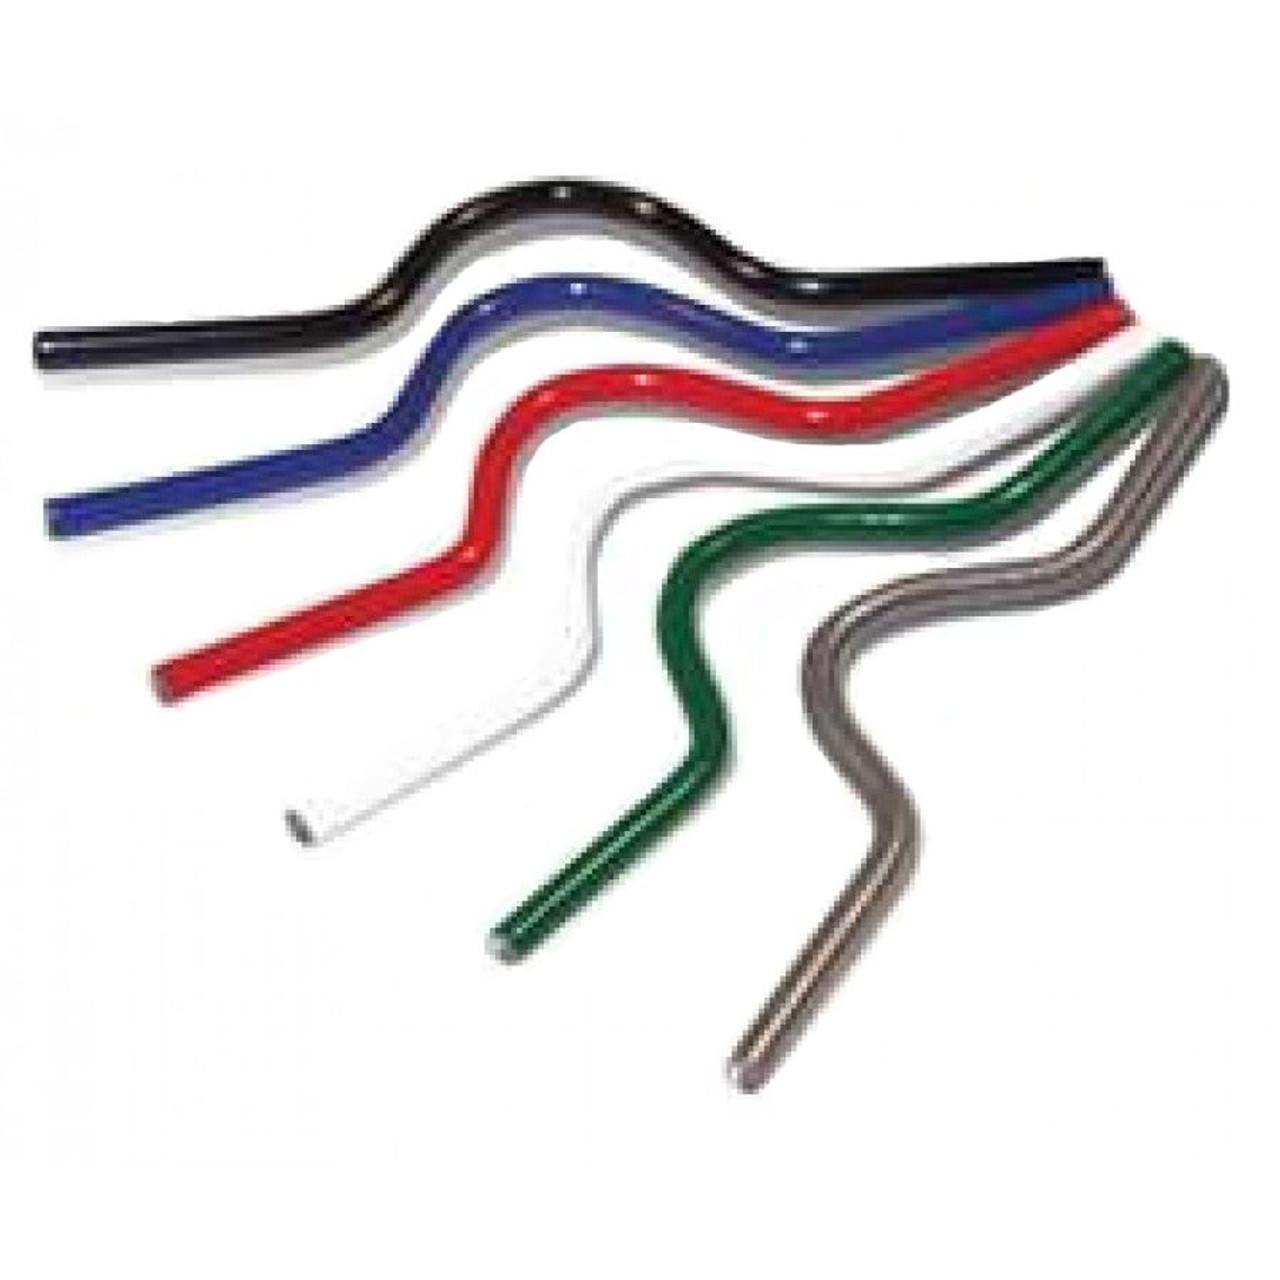 Renz Calendar Hangers / Hooks - Range of Sizes and Colours - 100 Pieces